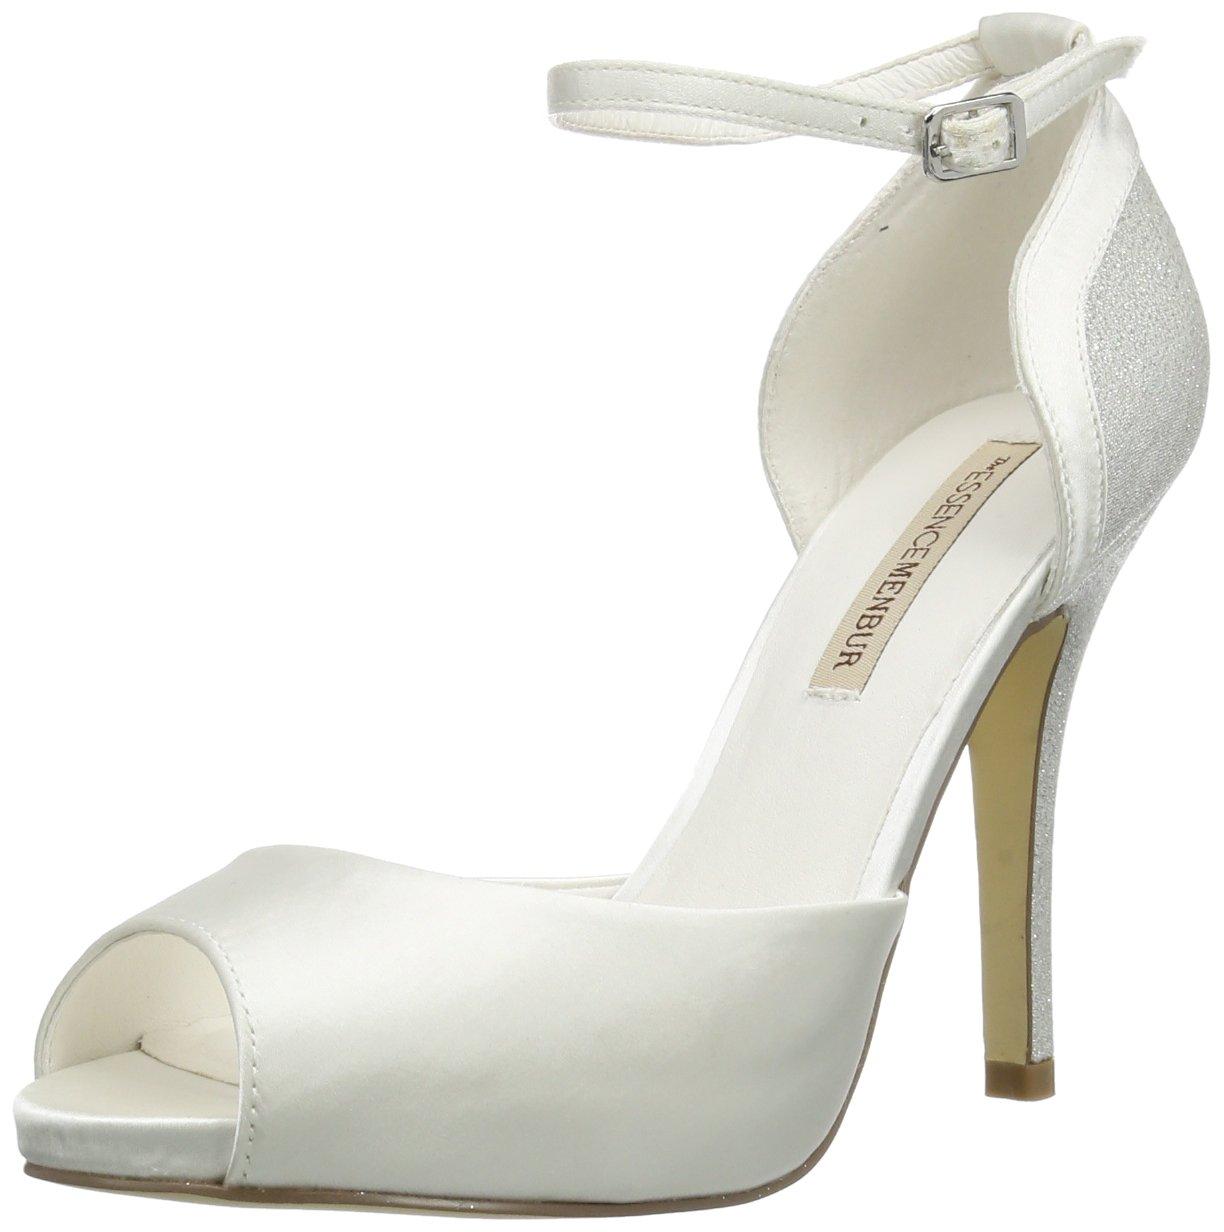 Menbur Wedding Gisela, Bride cheville 10248 (Ivory femme Blanc femme - Elfenbein (Ivory 04) 855179d - automaticcouplings.space